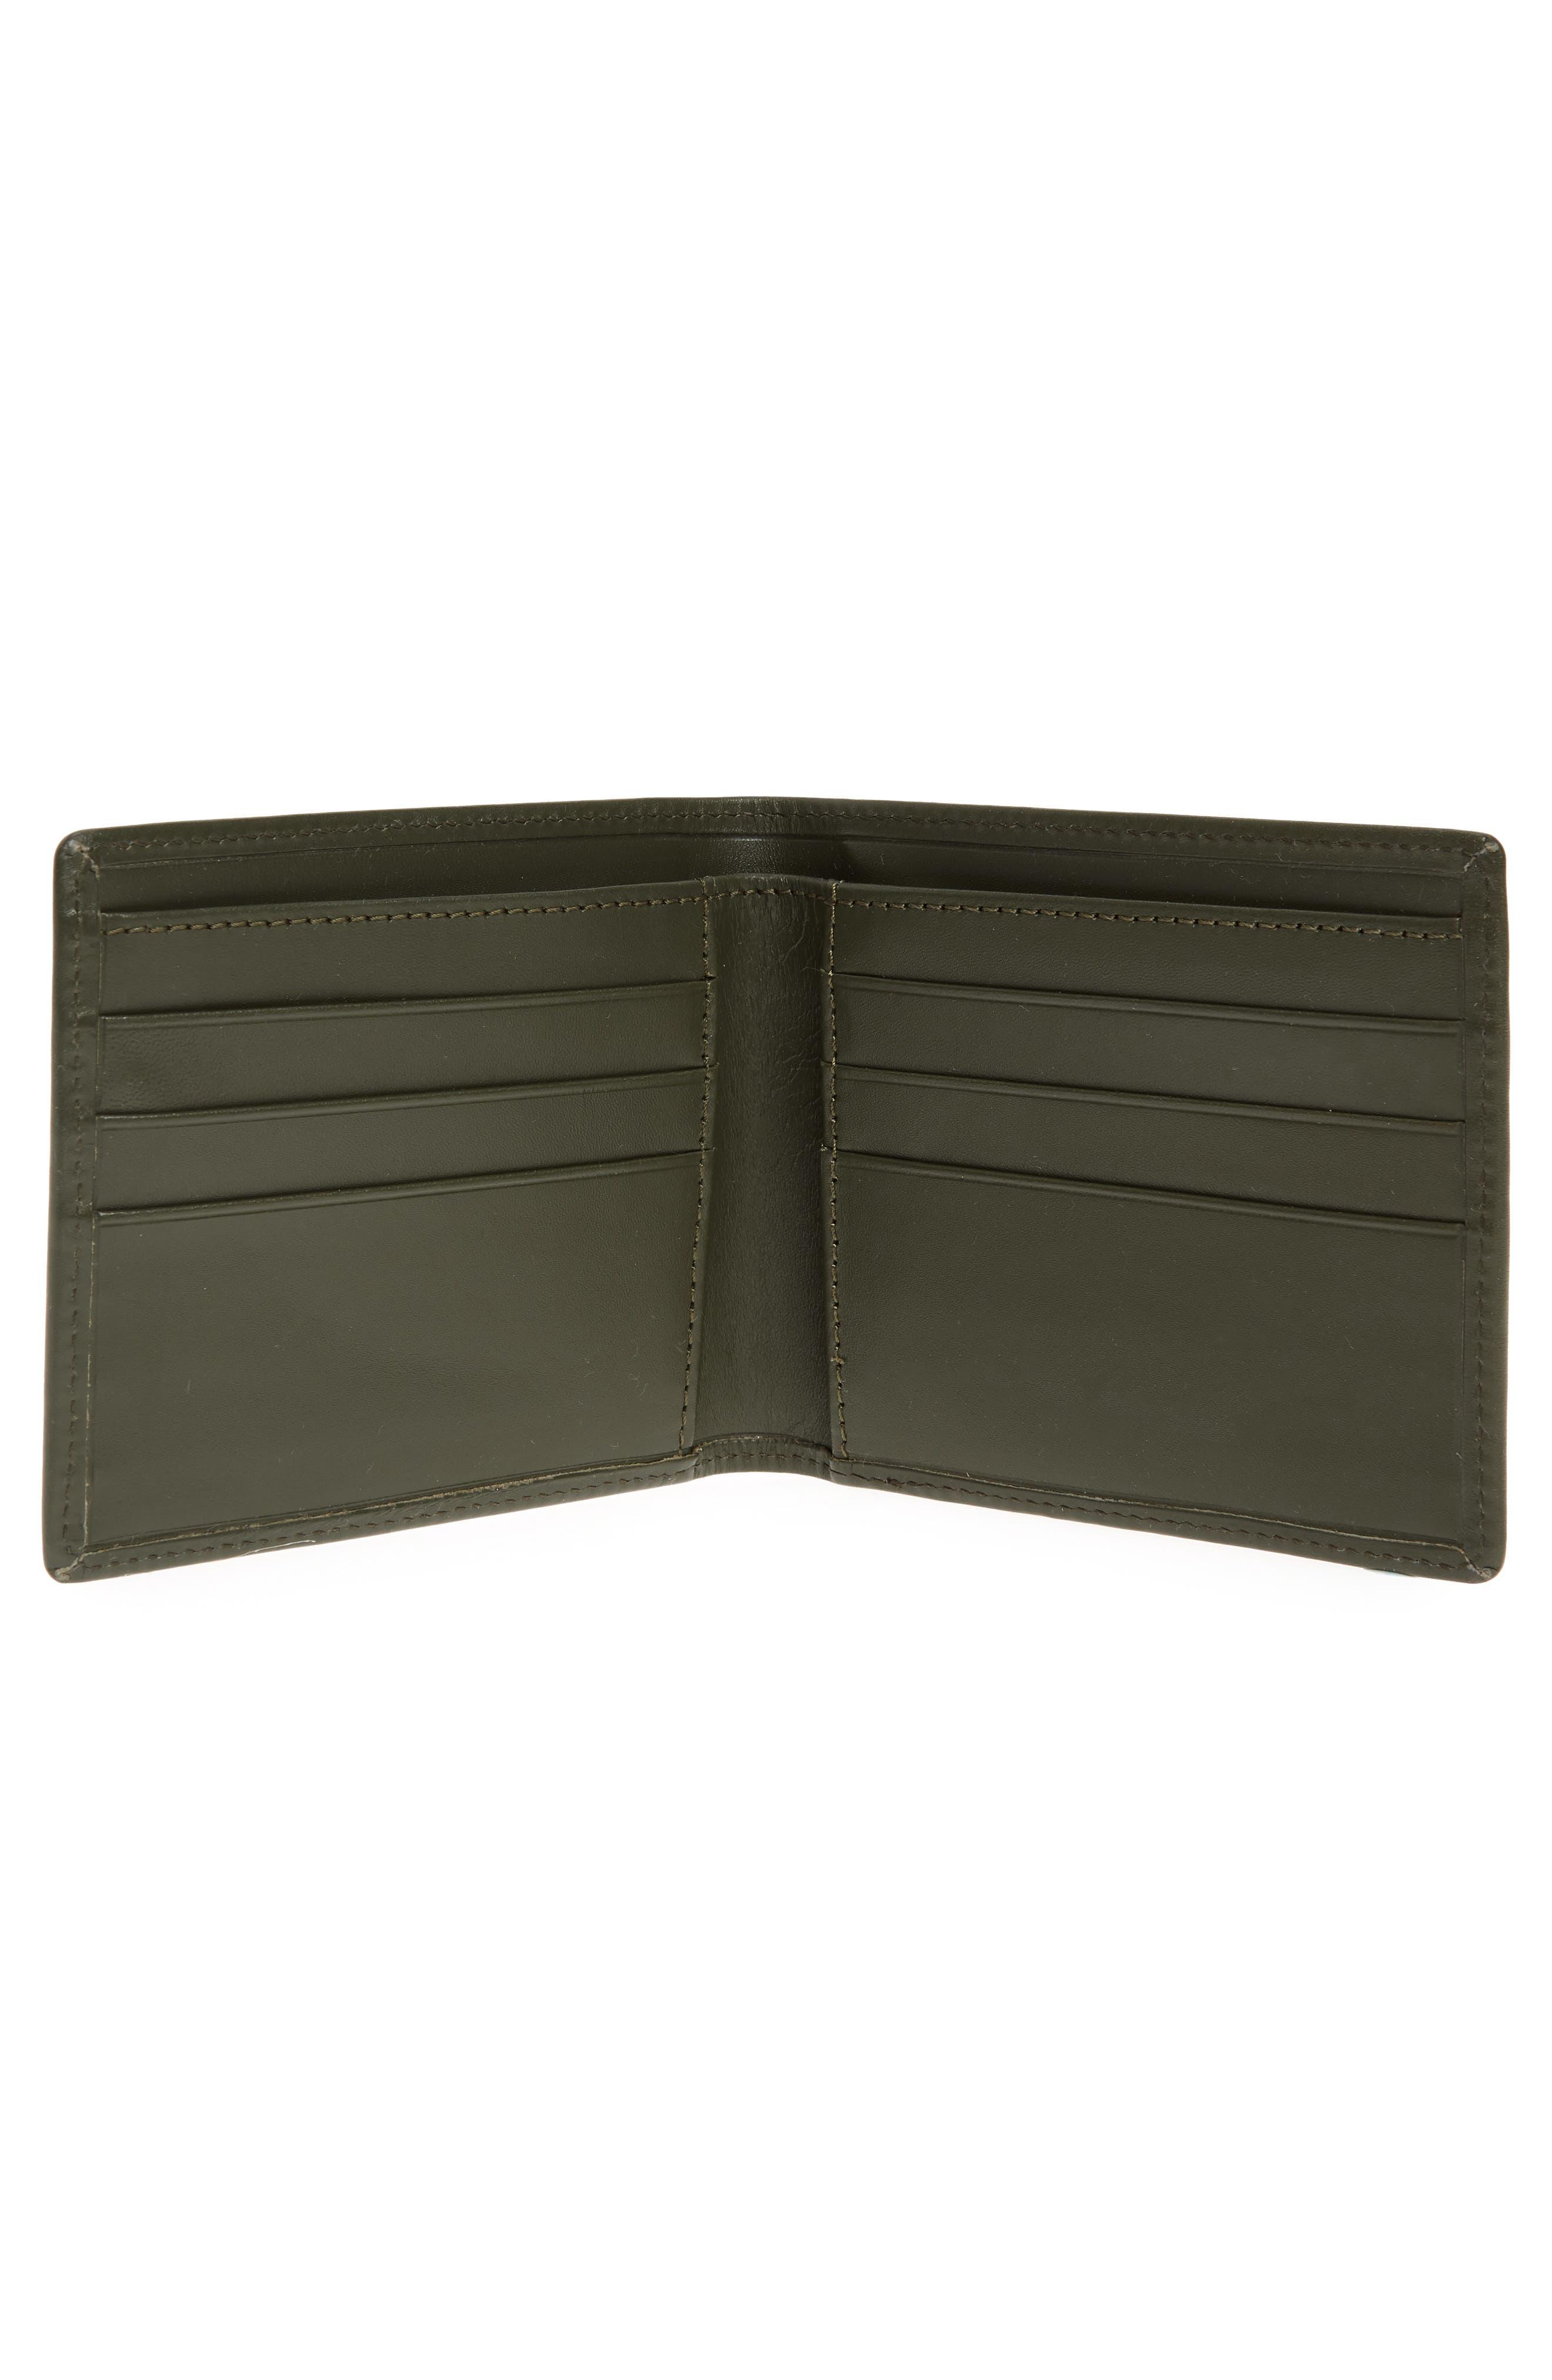 Aly Bifold Leather Wallet,                             Alternate thumbnail 2, color,                             Khaki